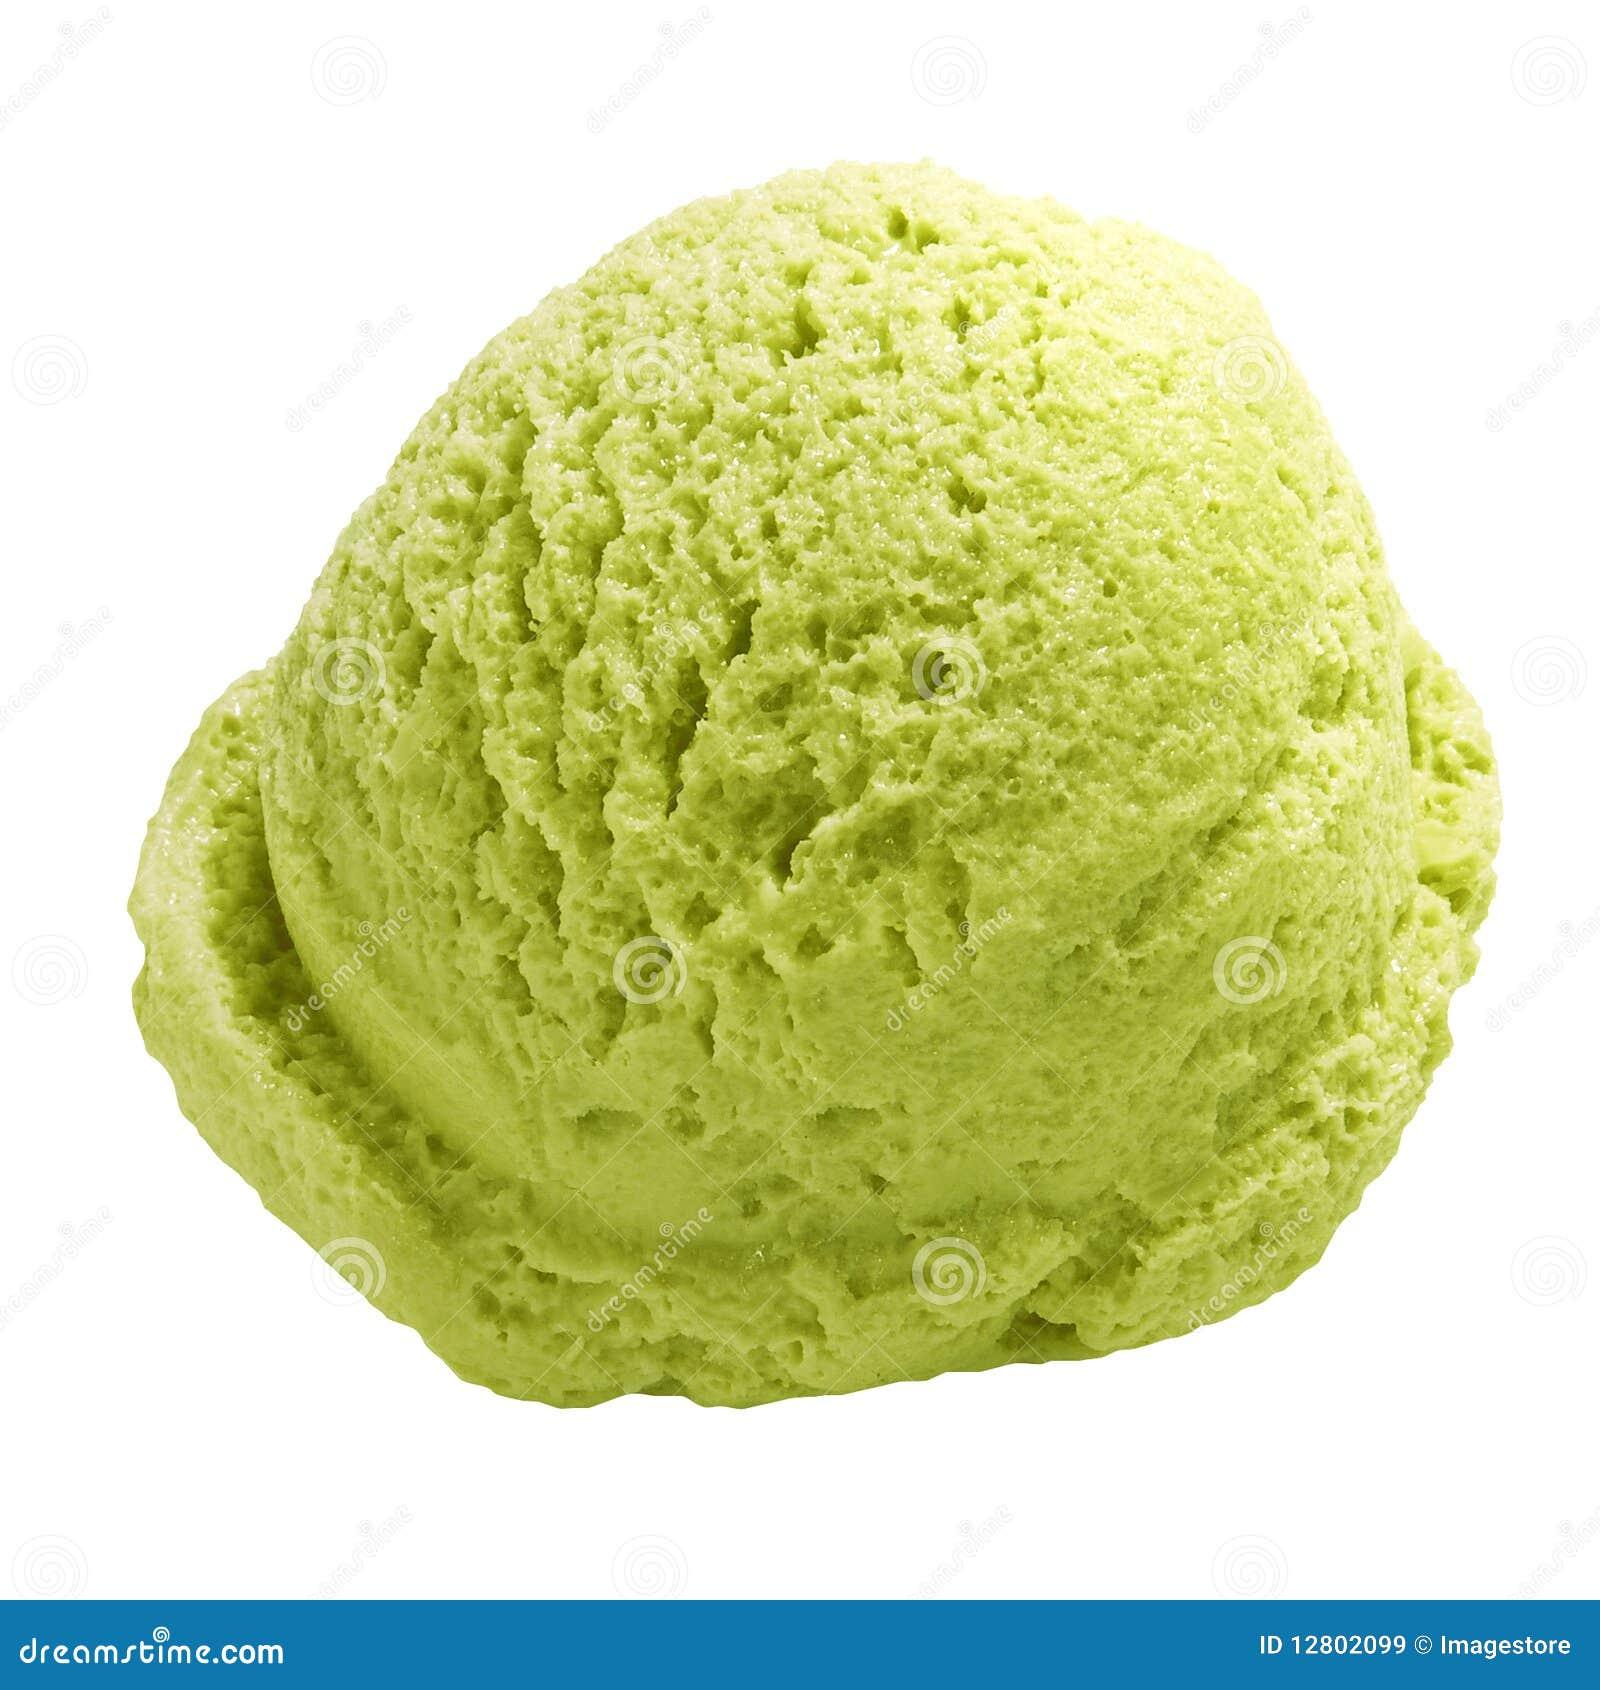 Pistachio Ice Cream Royalty Free Stock Images - Image: 12802099